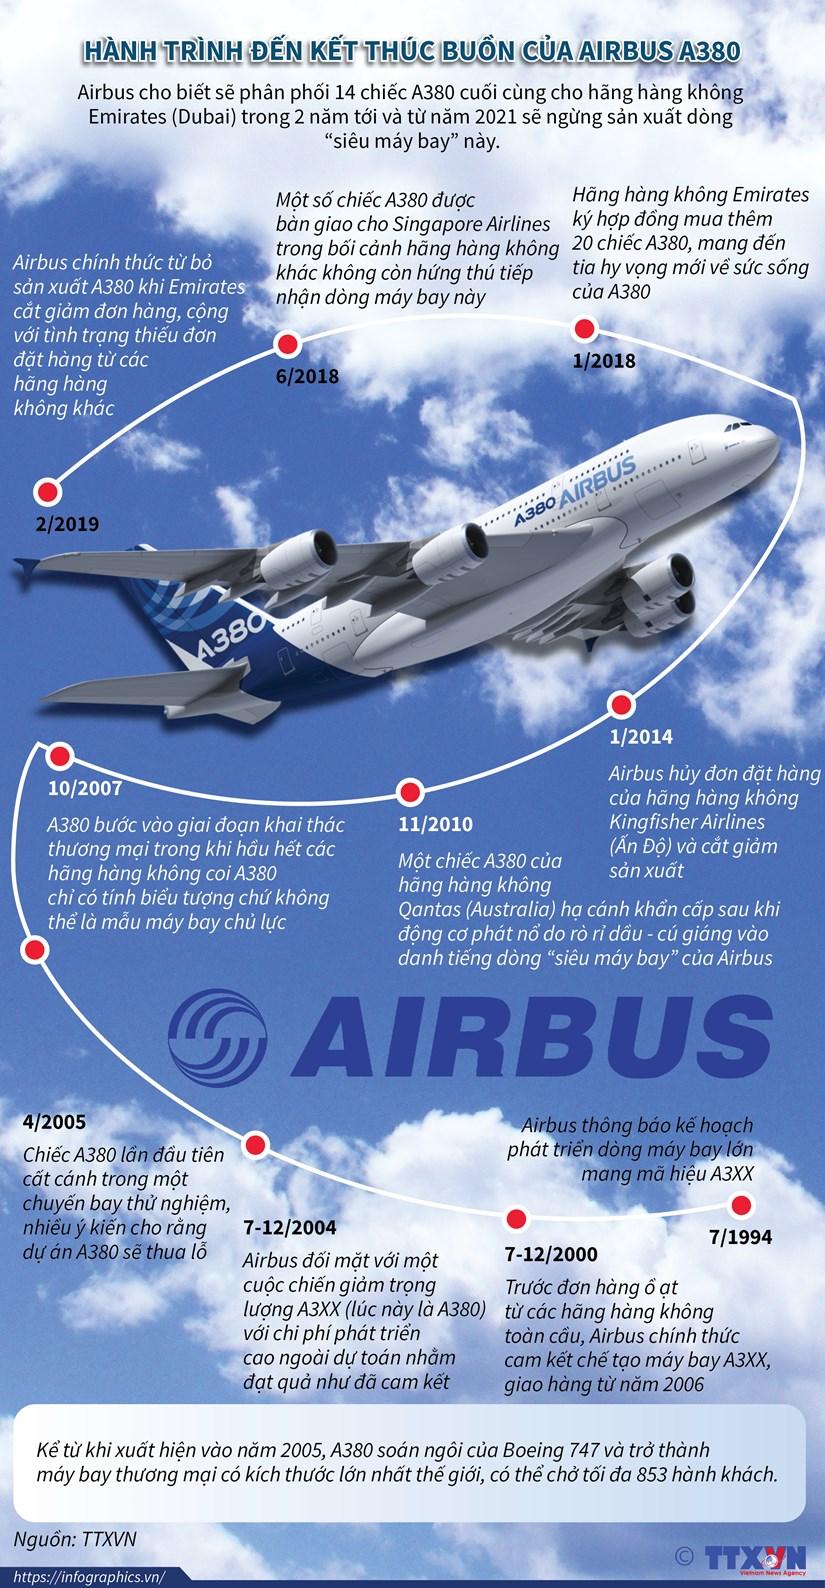 [Infographics] Hanh trinh dan den ket thuc buon cua Airbus A380 hinh anh 1